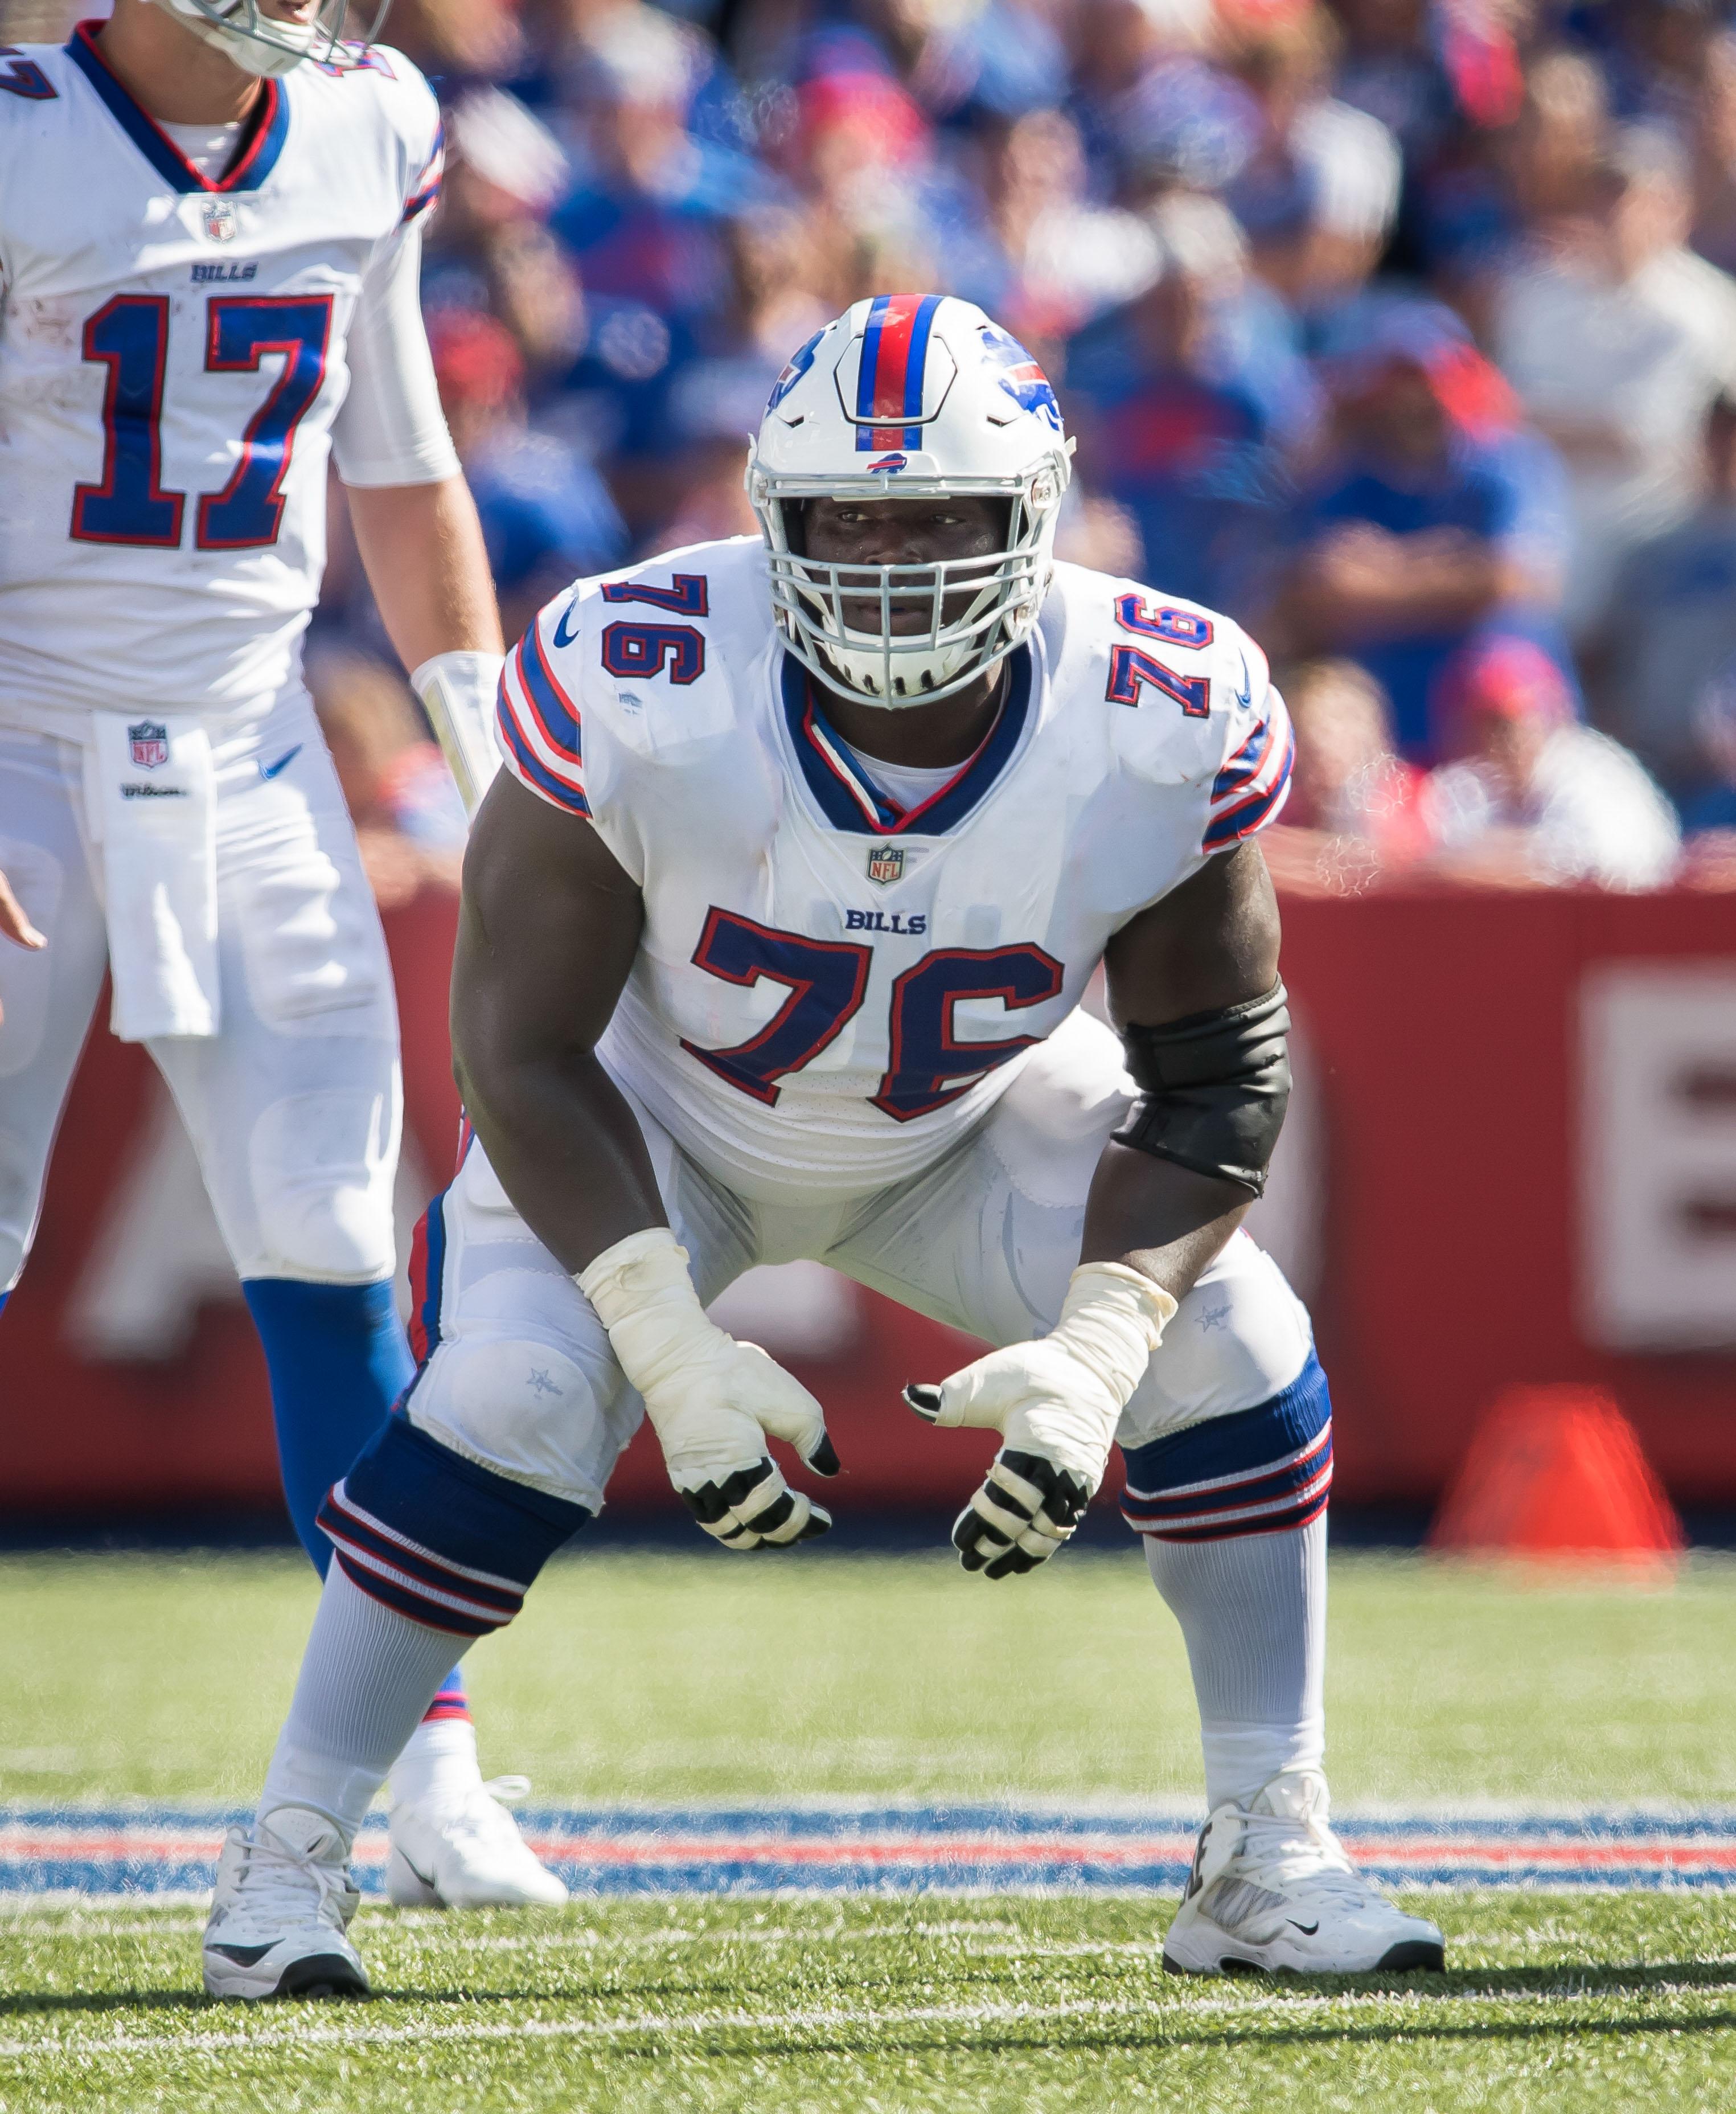 NFL: Los Angeles Chargers at Buffalo Bills